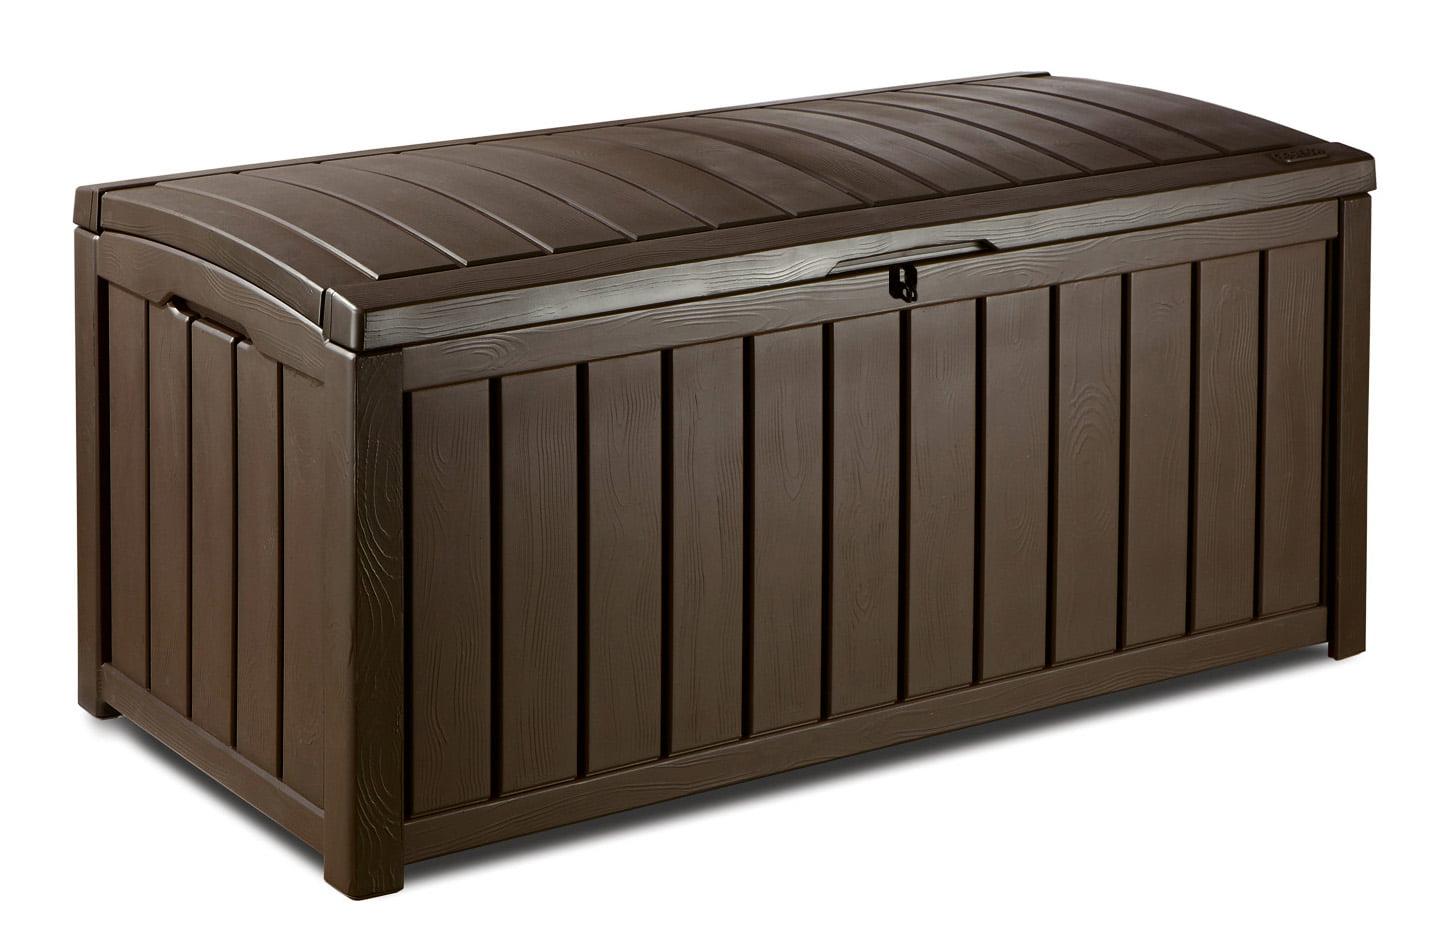 Keter Glenwood Outdoor Plastic Deck Storage Box 101 Gal Brown Walmart Com Walmart Com